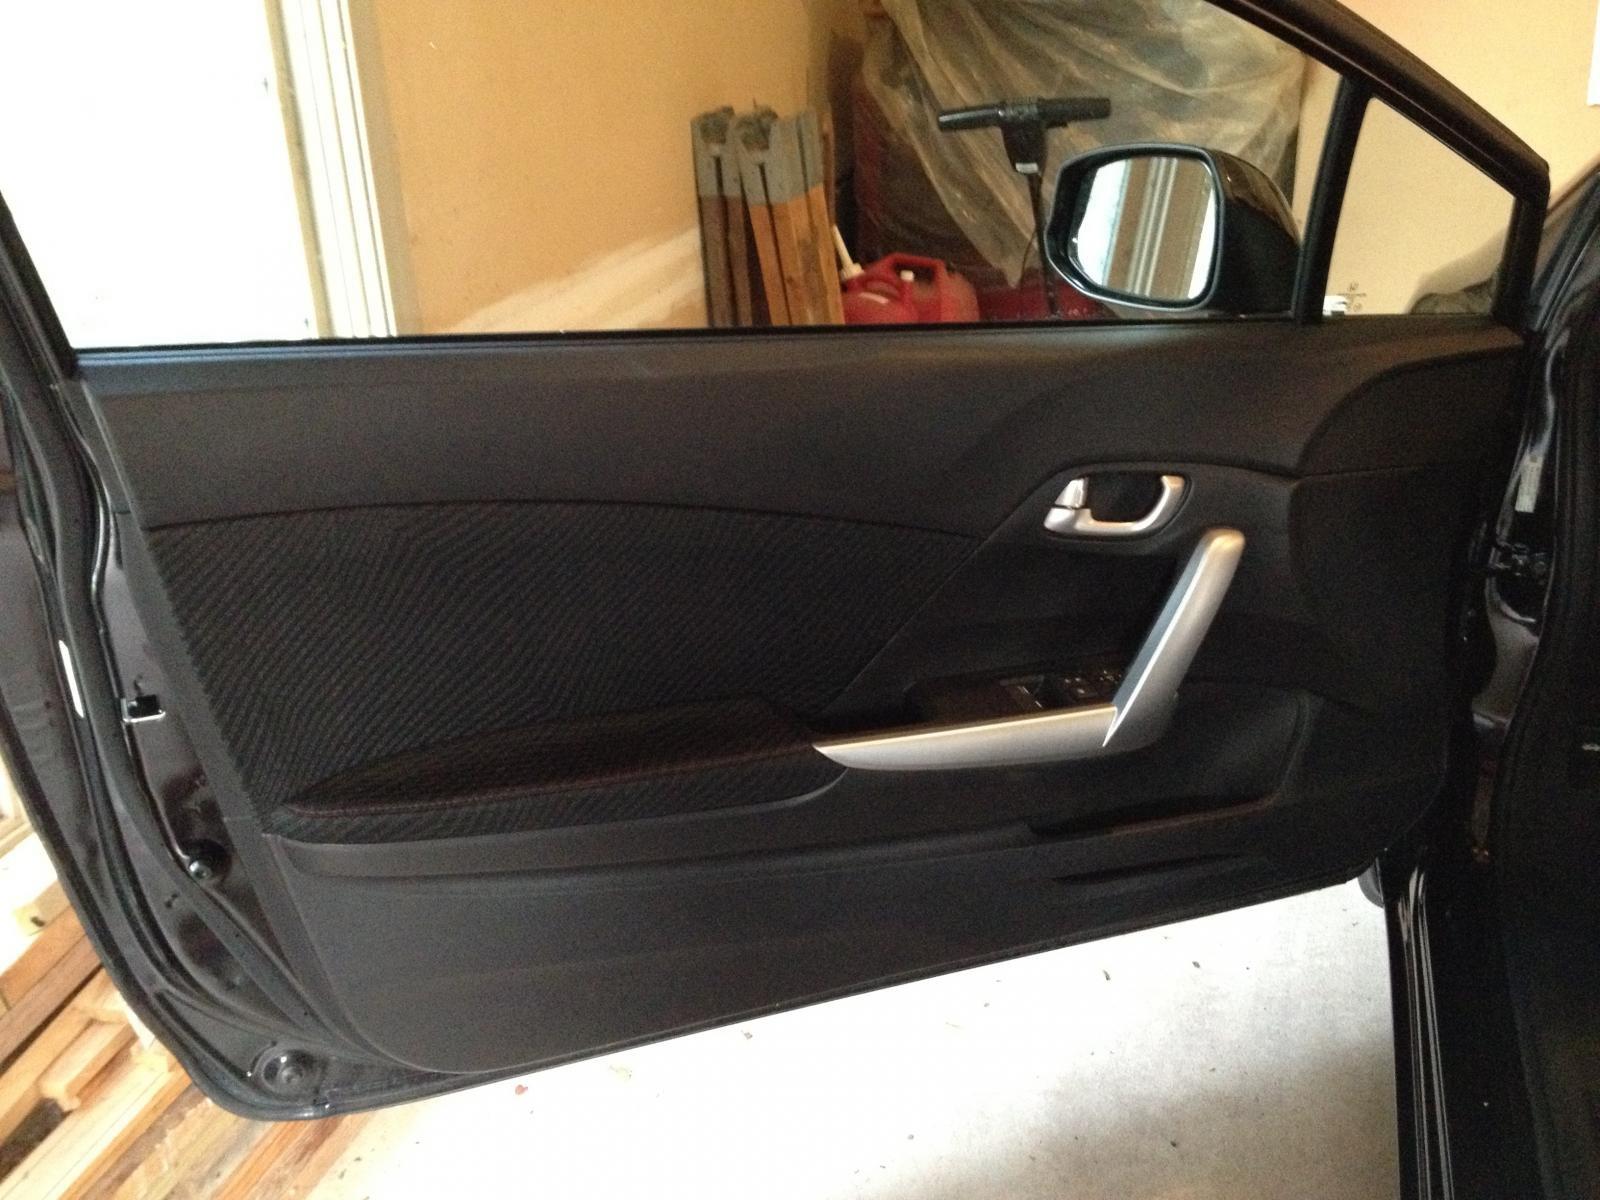 Car interior piping - Interior Door Piping Welt Trimming Img_0465 Jpg